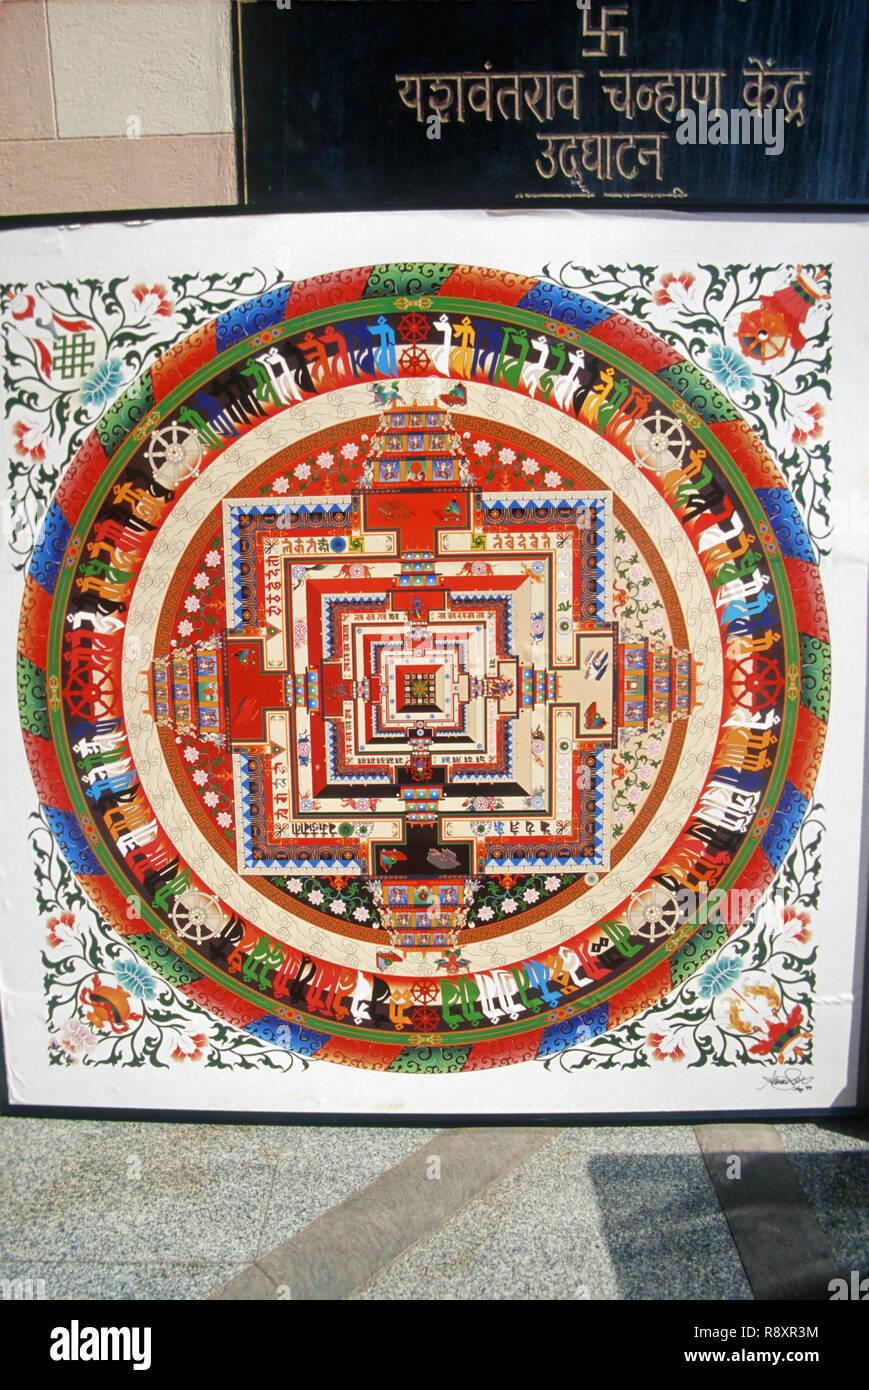 Mandala, Tibetan Paintings - Stock Image